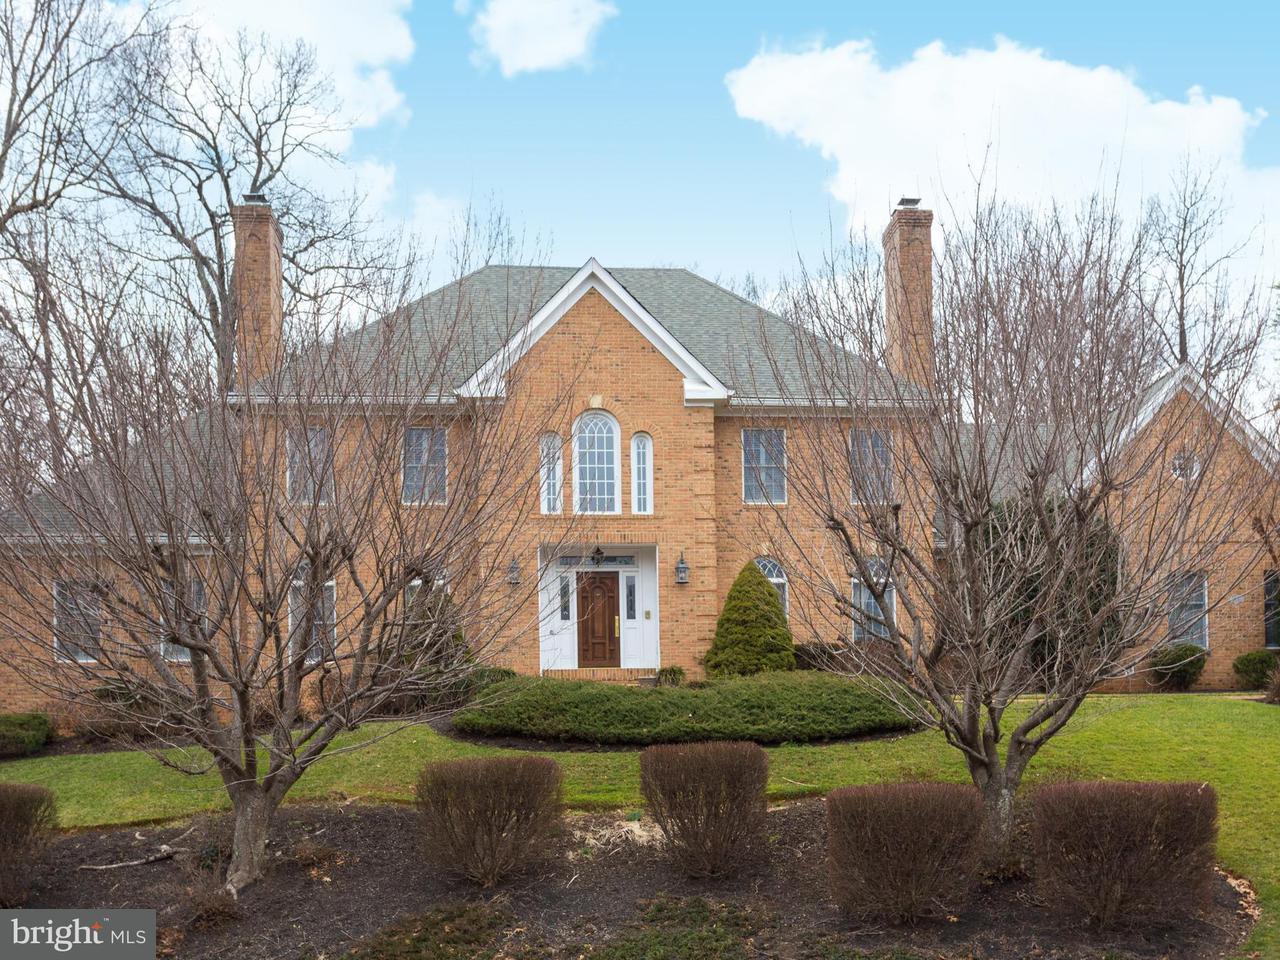 Single Family Home for Sale at 10604 Hannah Farm Road 10604 Hannah Farm Road Oakton, Virginia 22124 United States